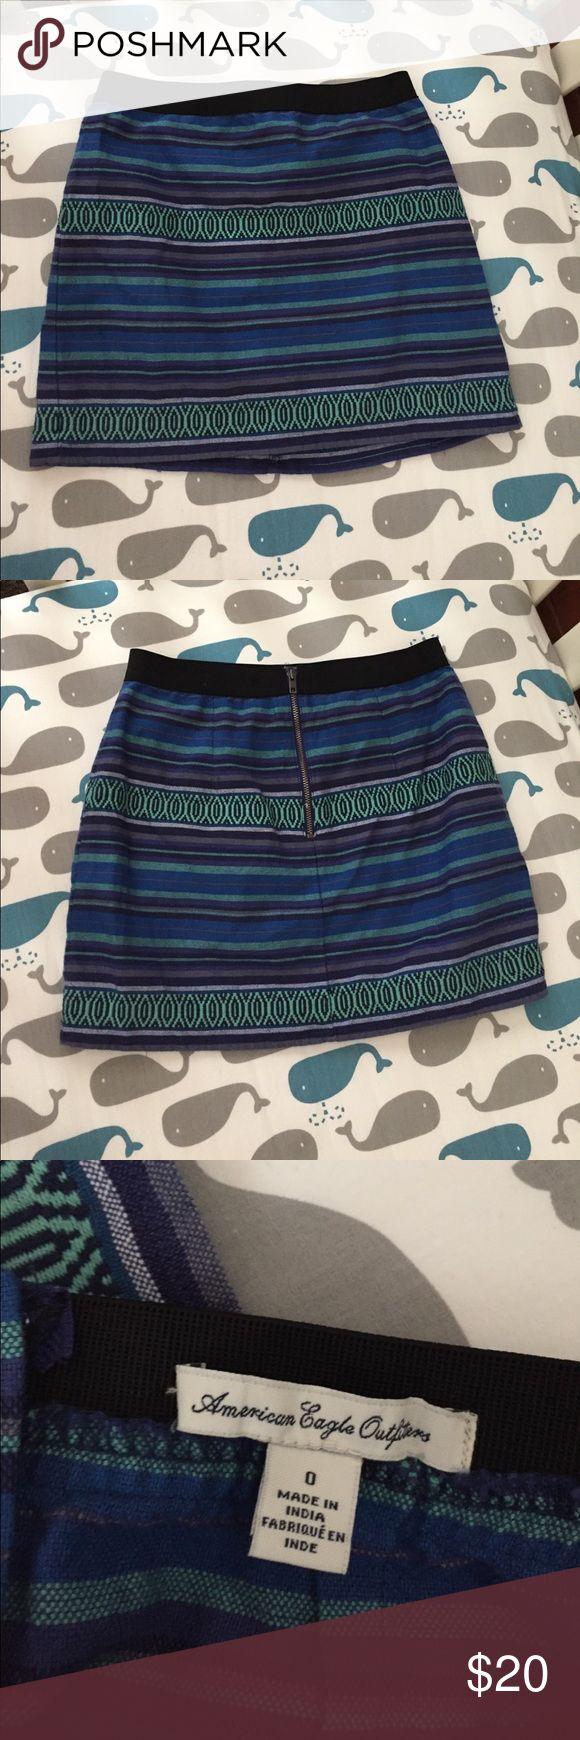 AEO Mini Skirt Super cute American Eagle 🦅 mini skirt in EUC. Size 0. American Eagle Outfitters Skirts Mini